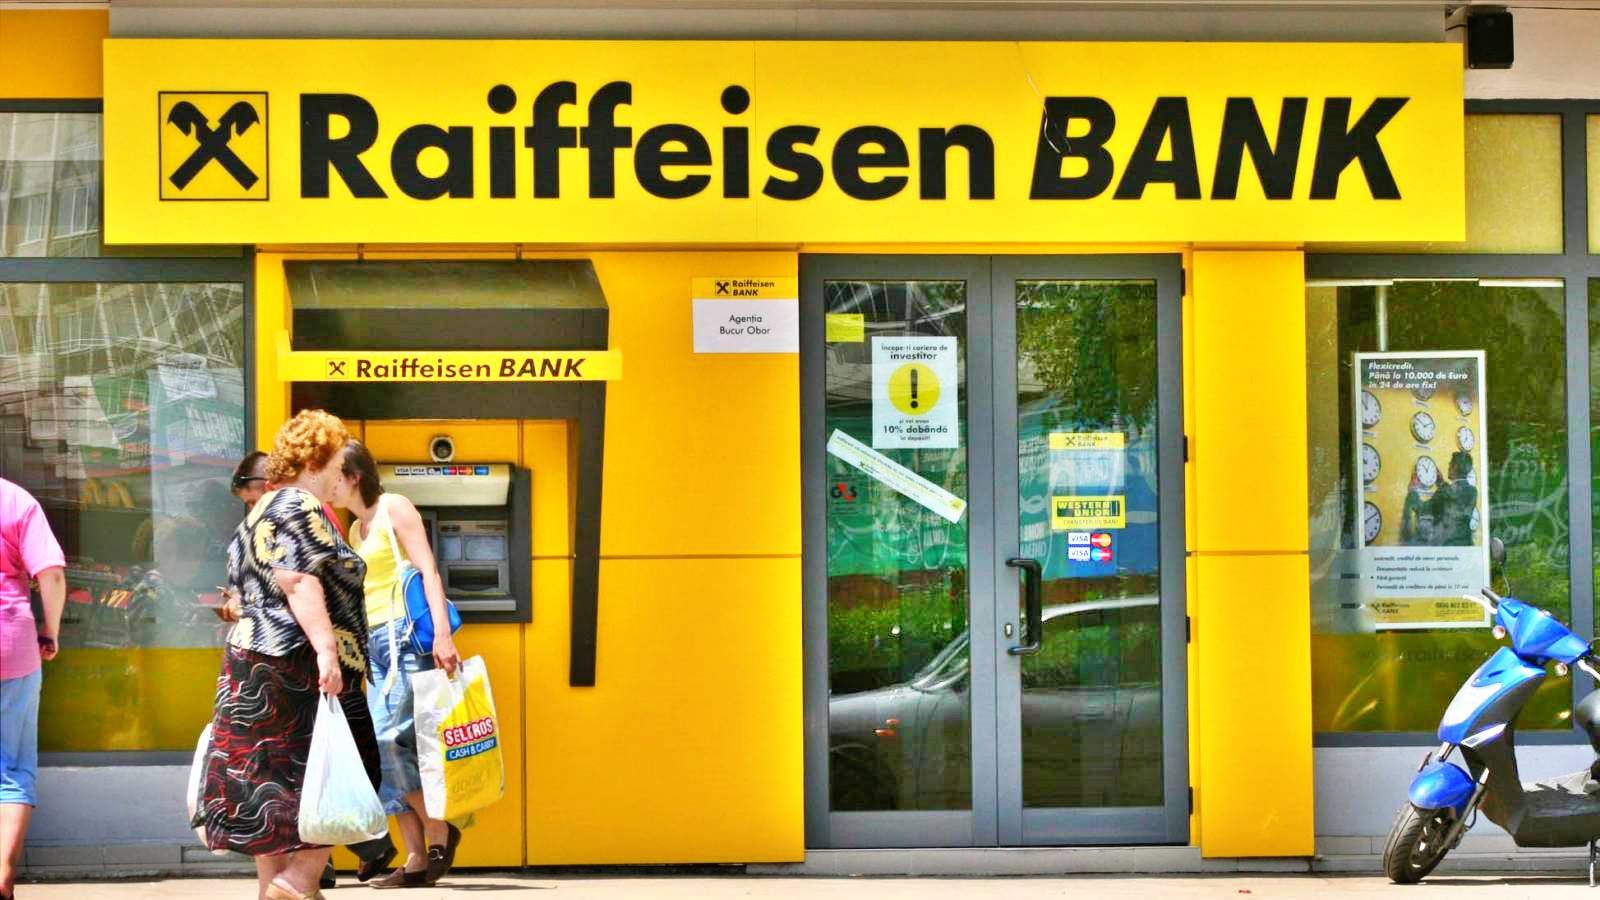 Raiffeisen Bank personal